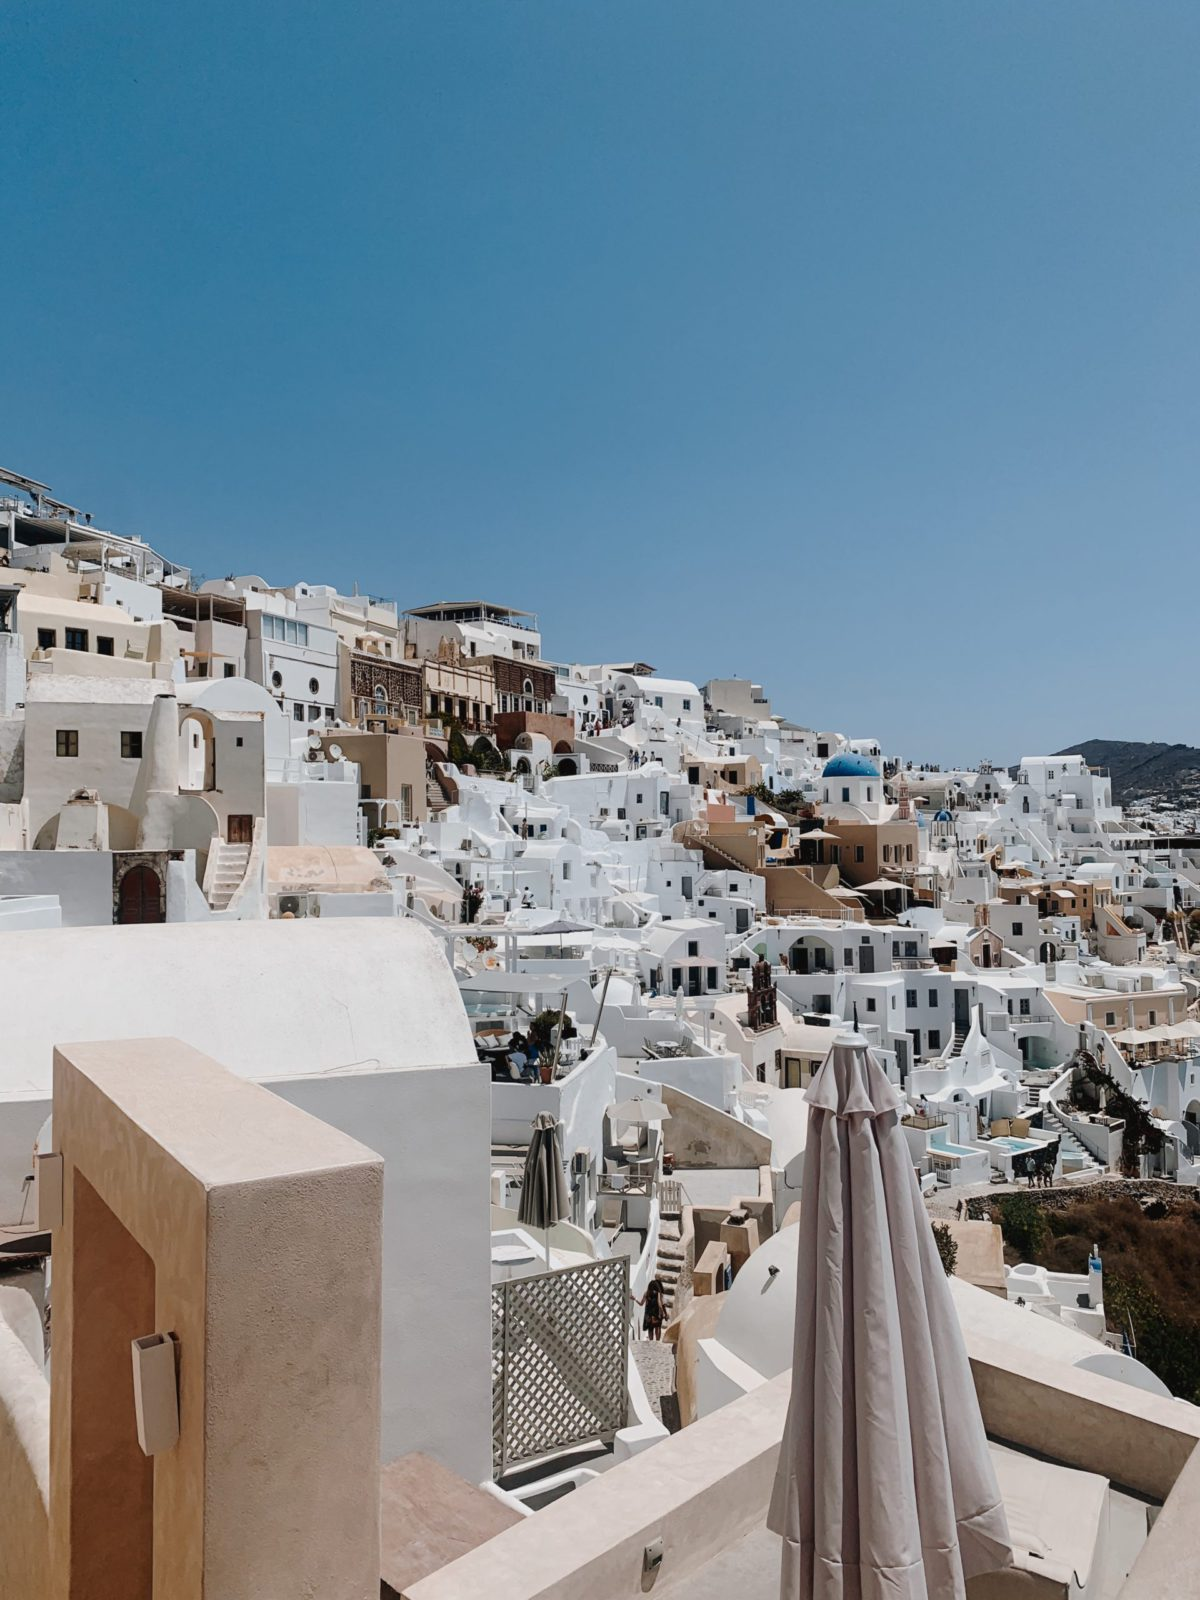 View of Santorini, Greece